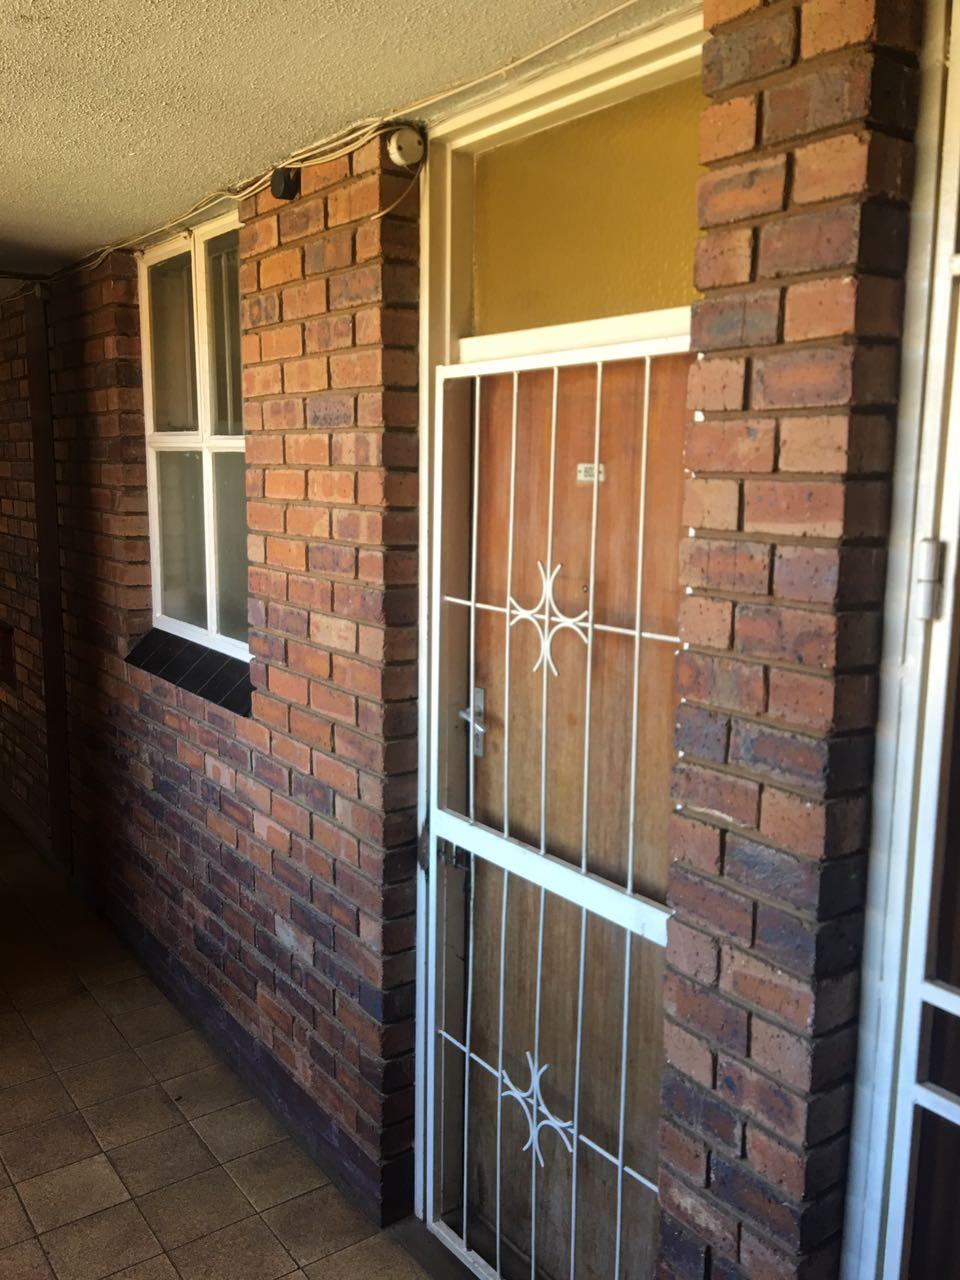 1.5 Bedroom Available for Rent, North Gardens, Pretoria North | Junk ...